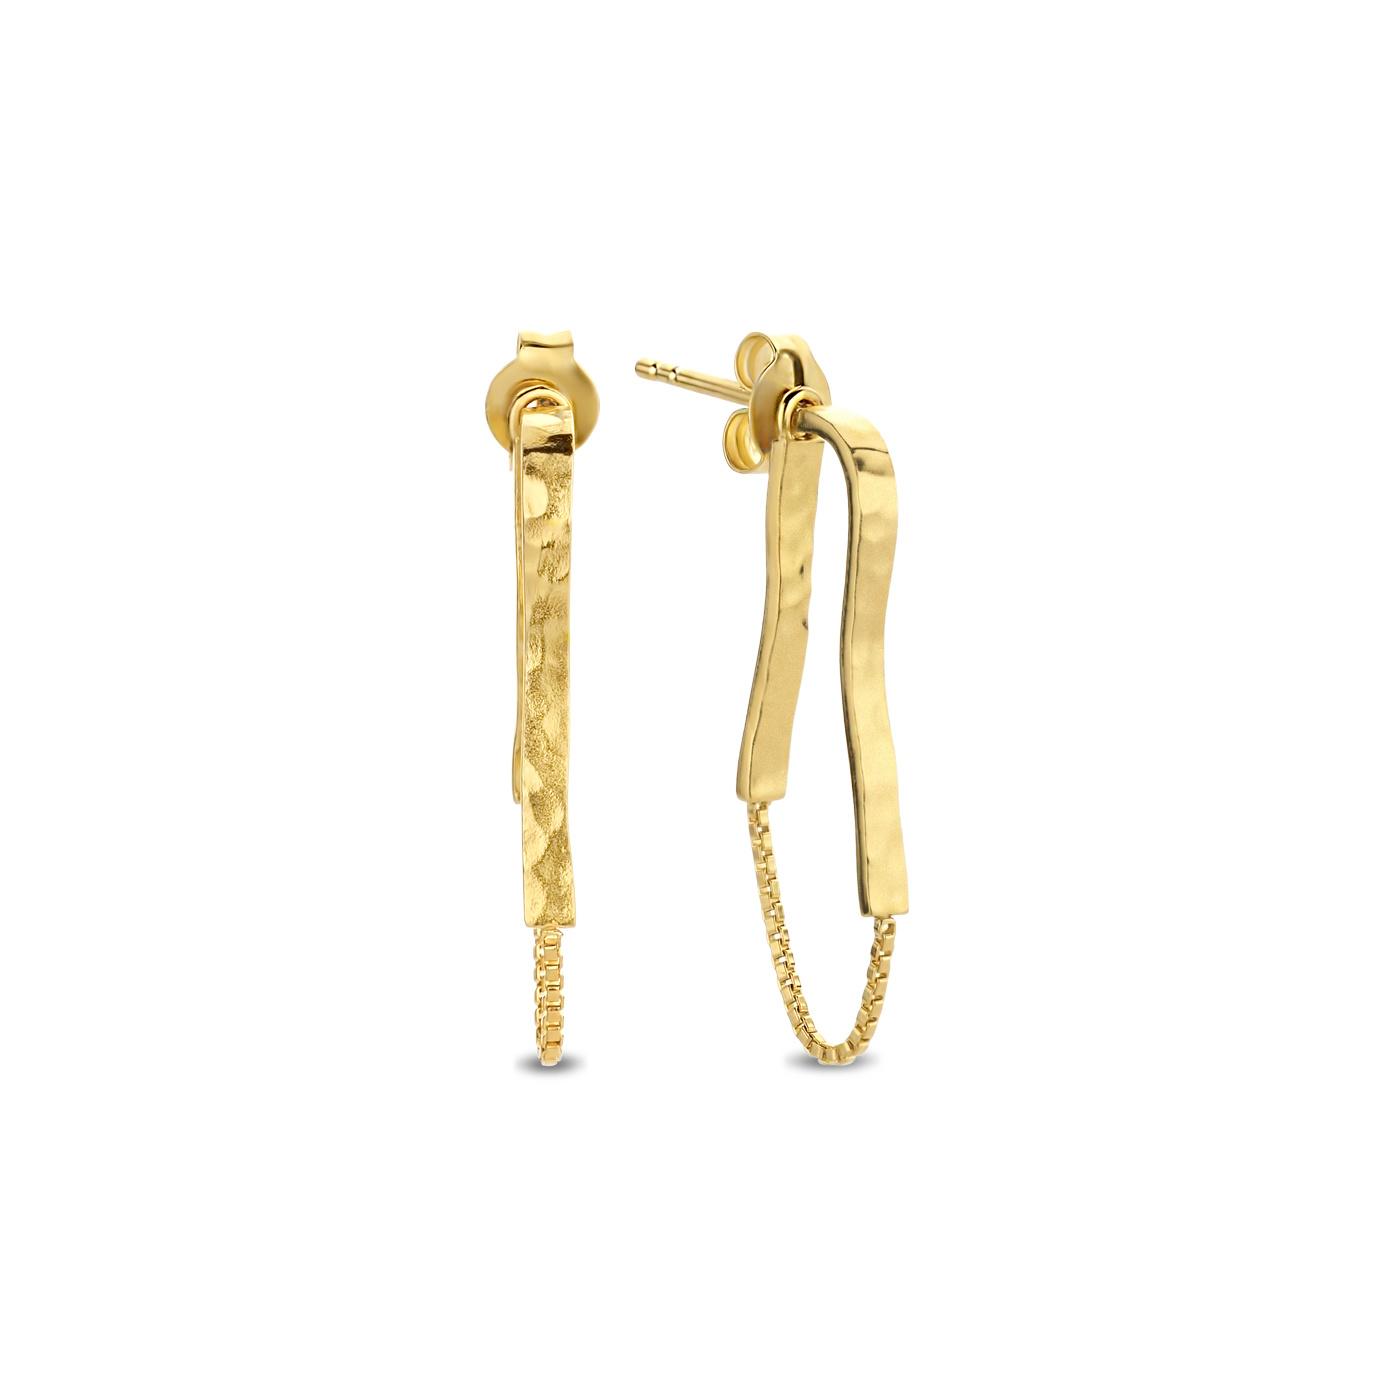 Violet Hamden Sisterhood Moonscape orecchini pendenti color oro in argento sterling 925